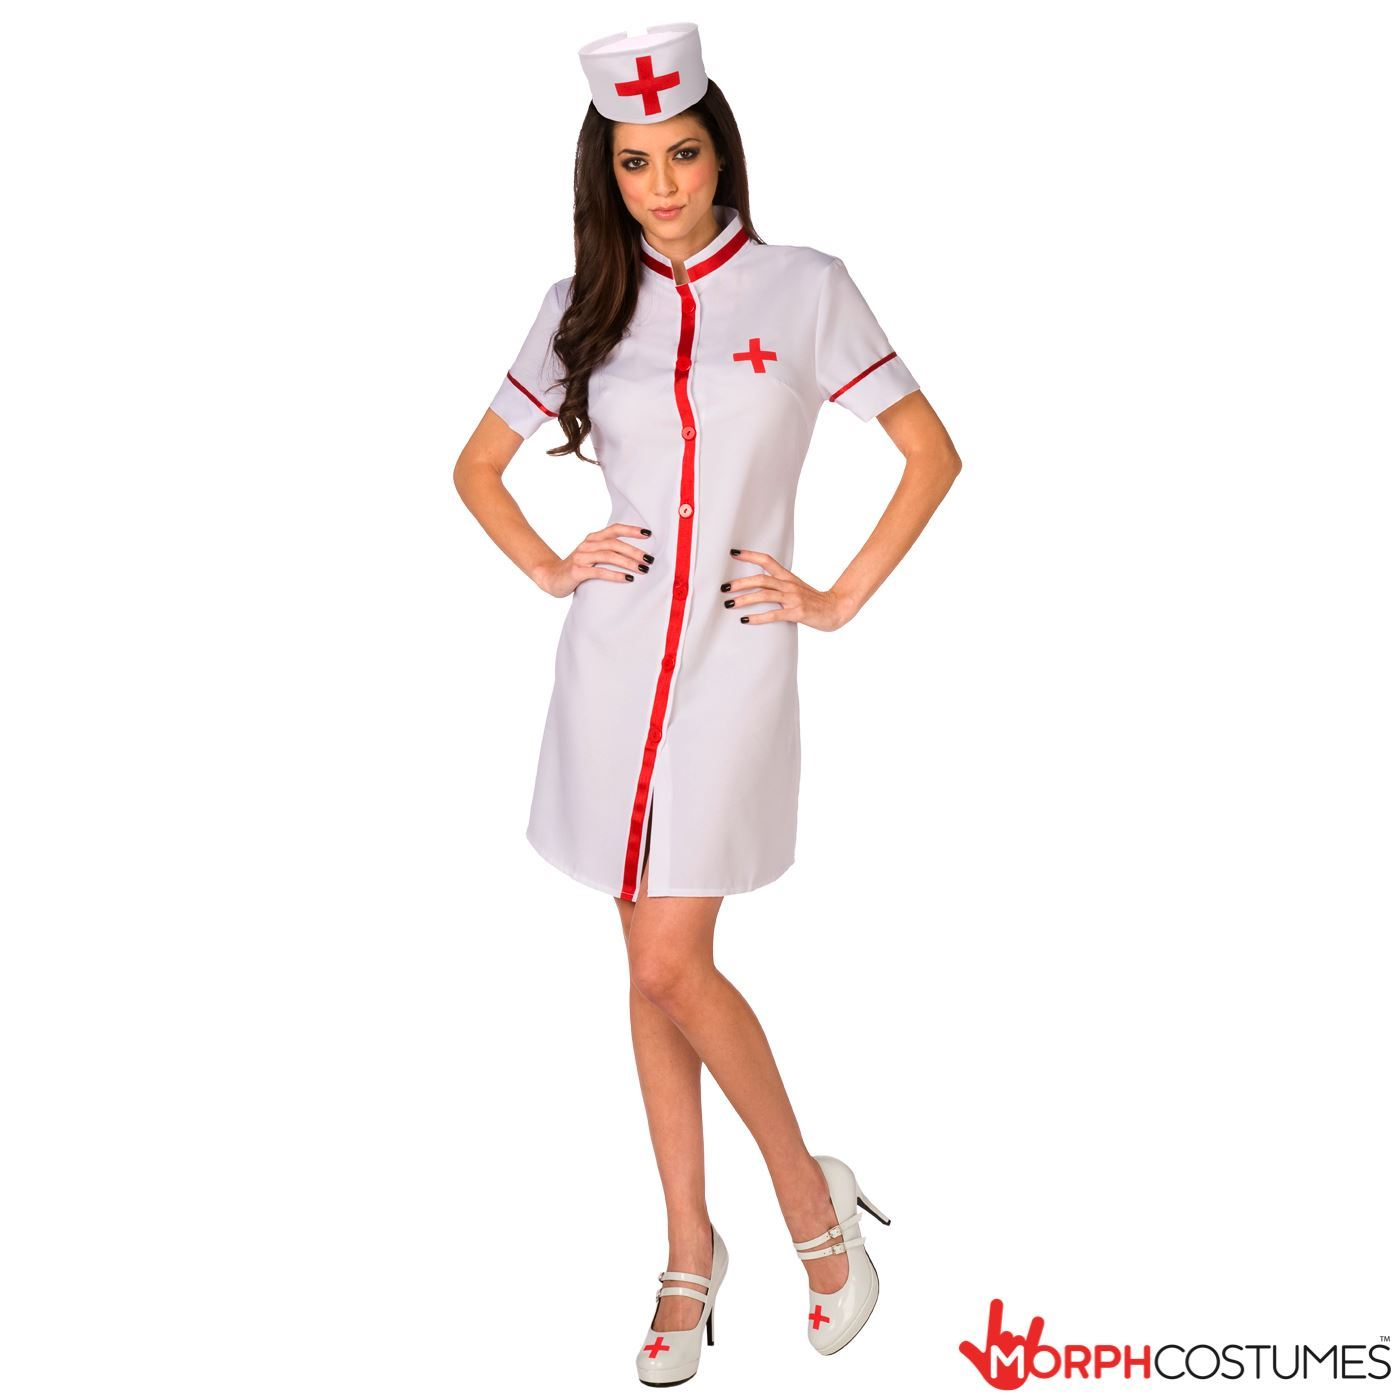 Women in nurse costume porn pics cartoon pics